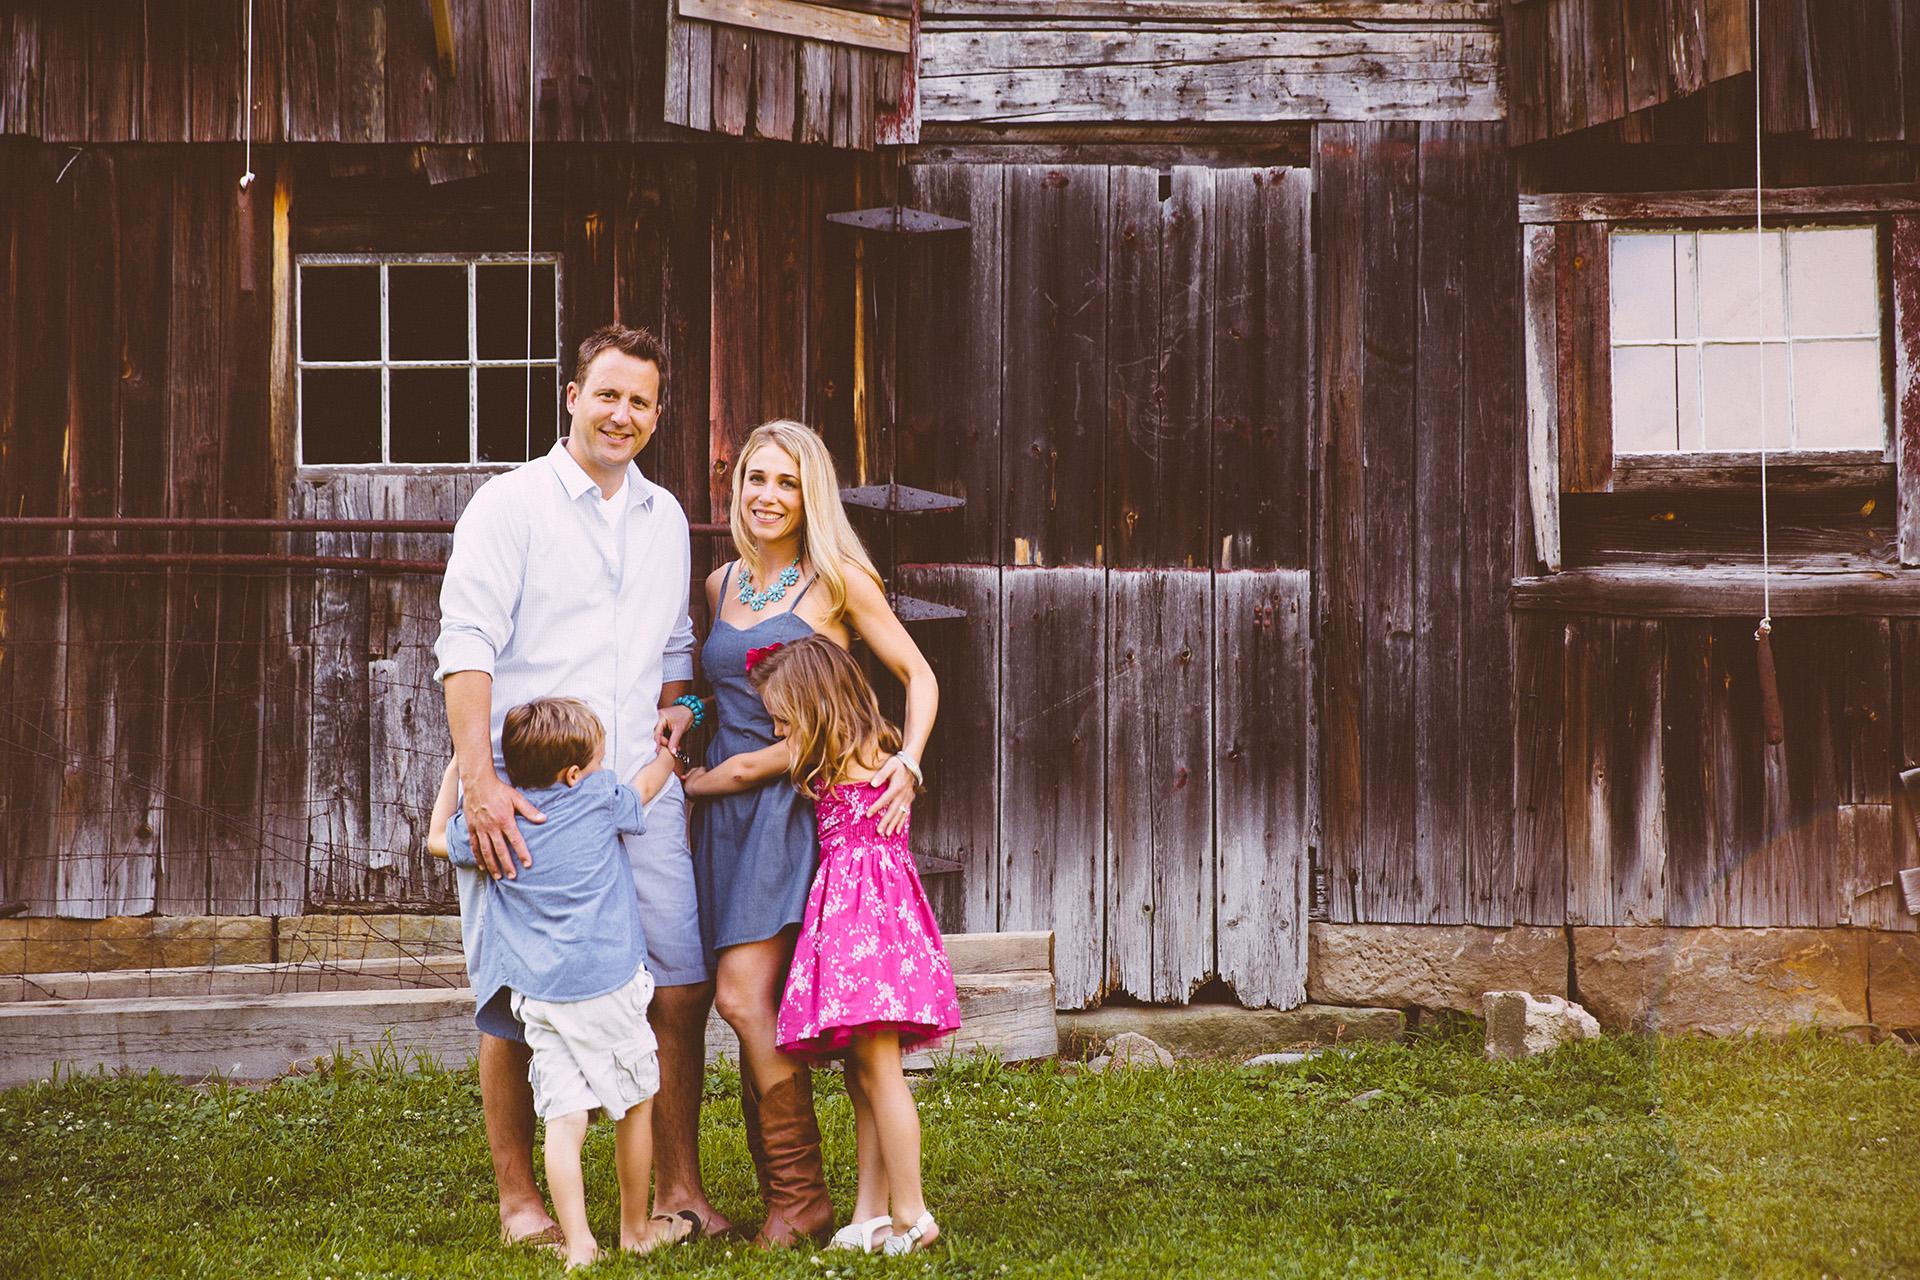 Cleveland Lifestyle Family Portrait Photographer 02.jpg